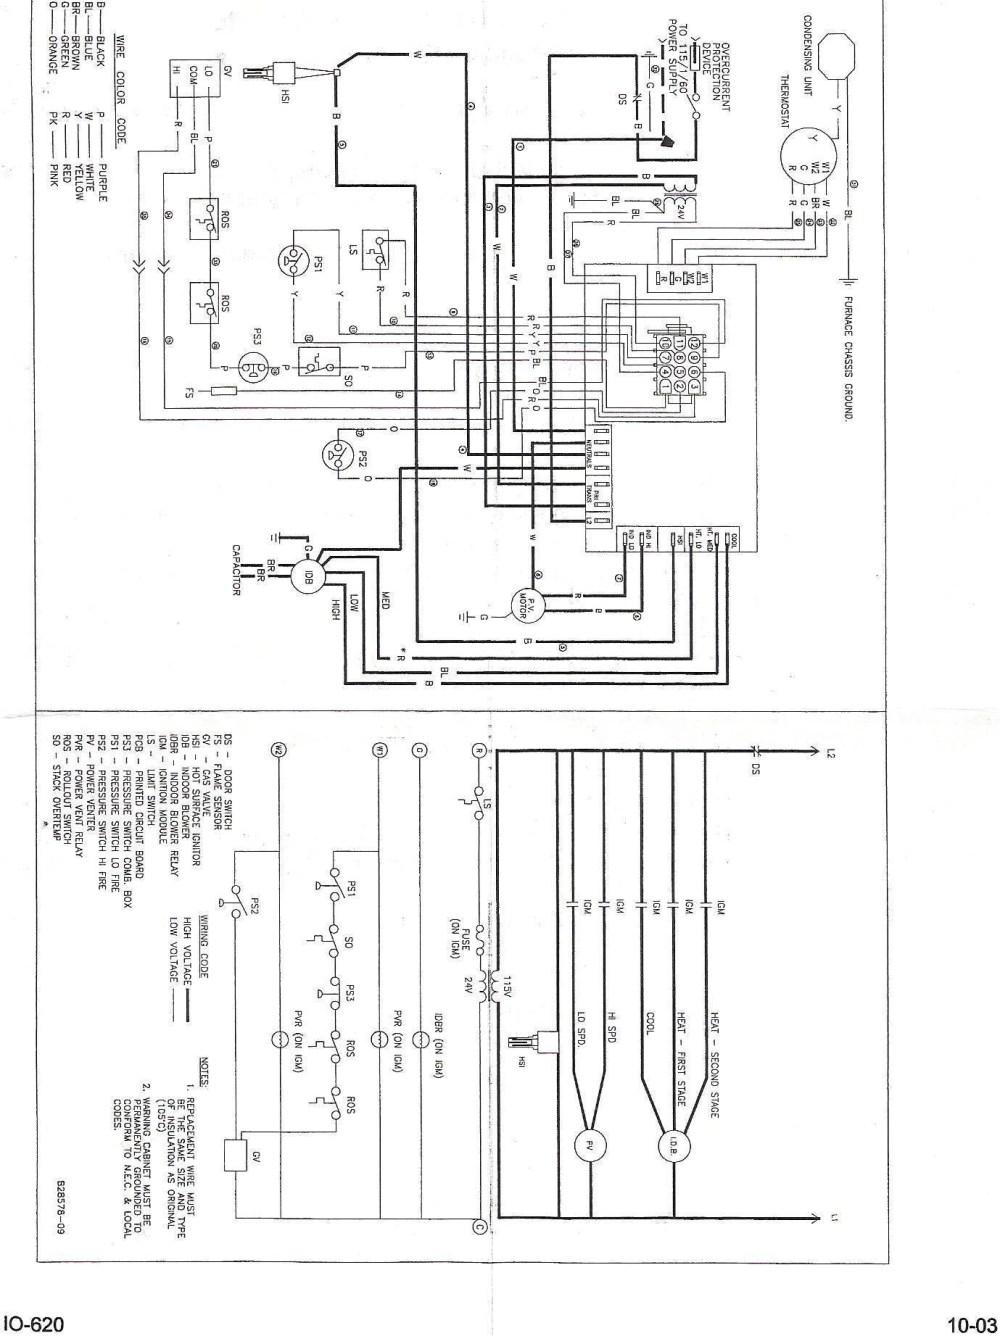 medium resolution of first pany air handler wiring diagram 2018 ruud air handler wiring diagram 2018 endearing enchanting 8